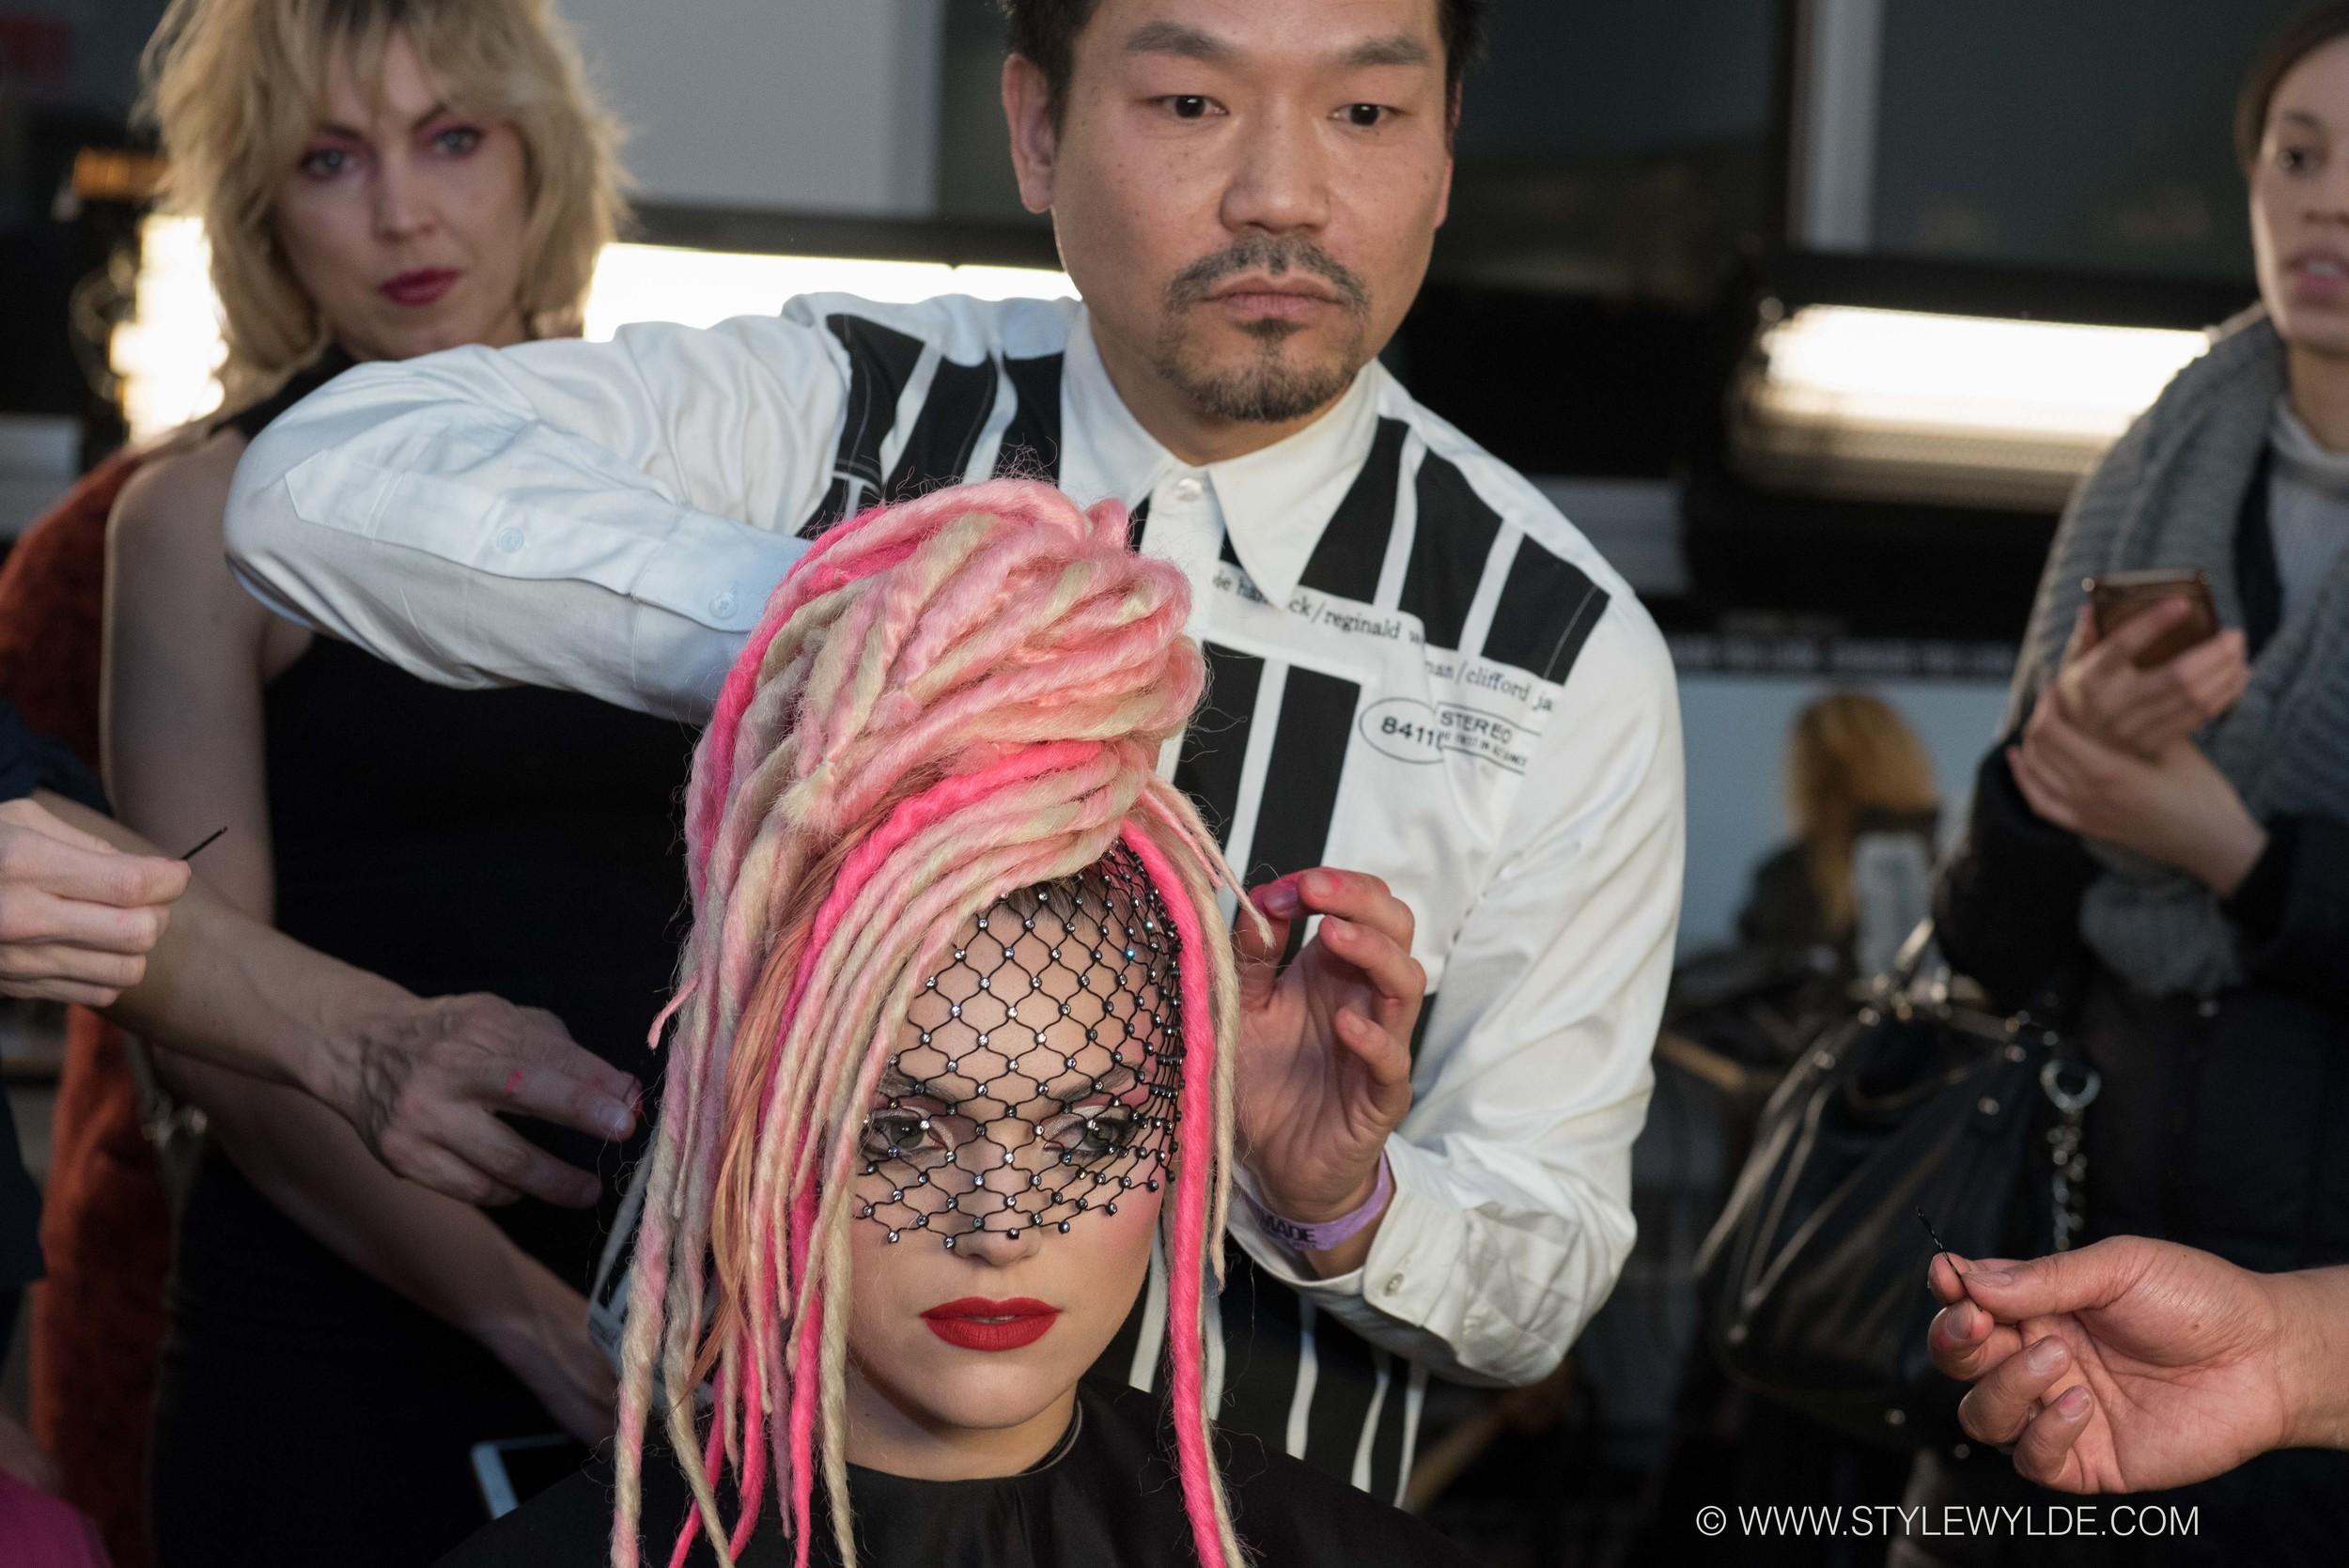 StyleWylde - The blonds- AW16-Bkstg-14.jpg